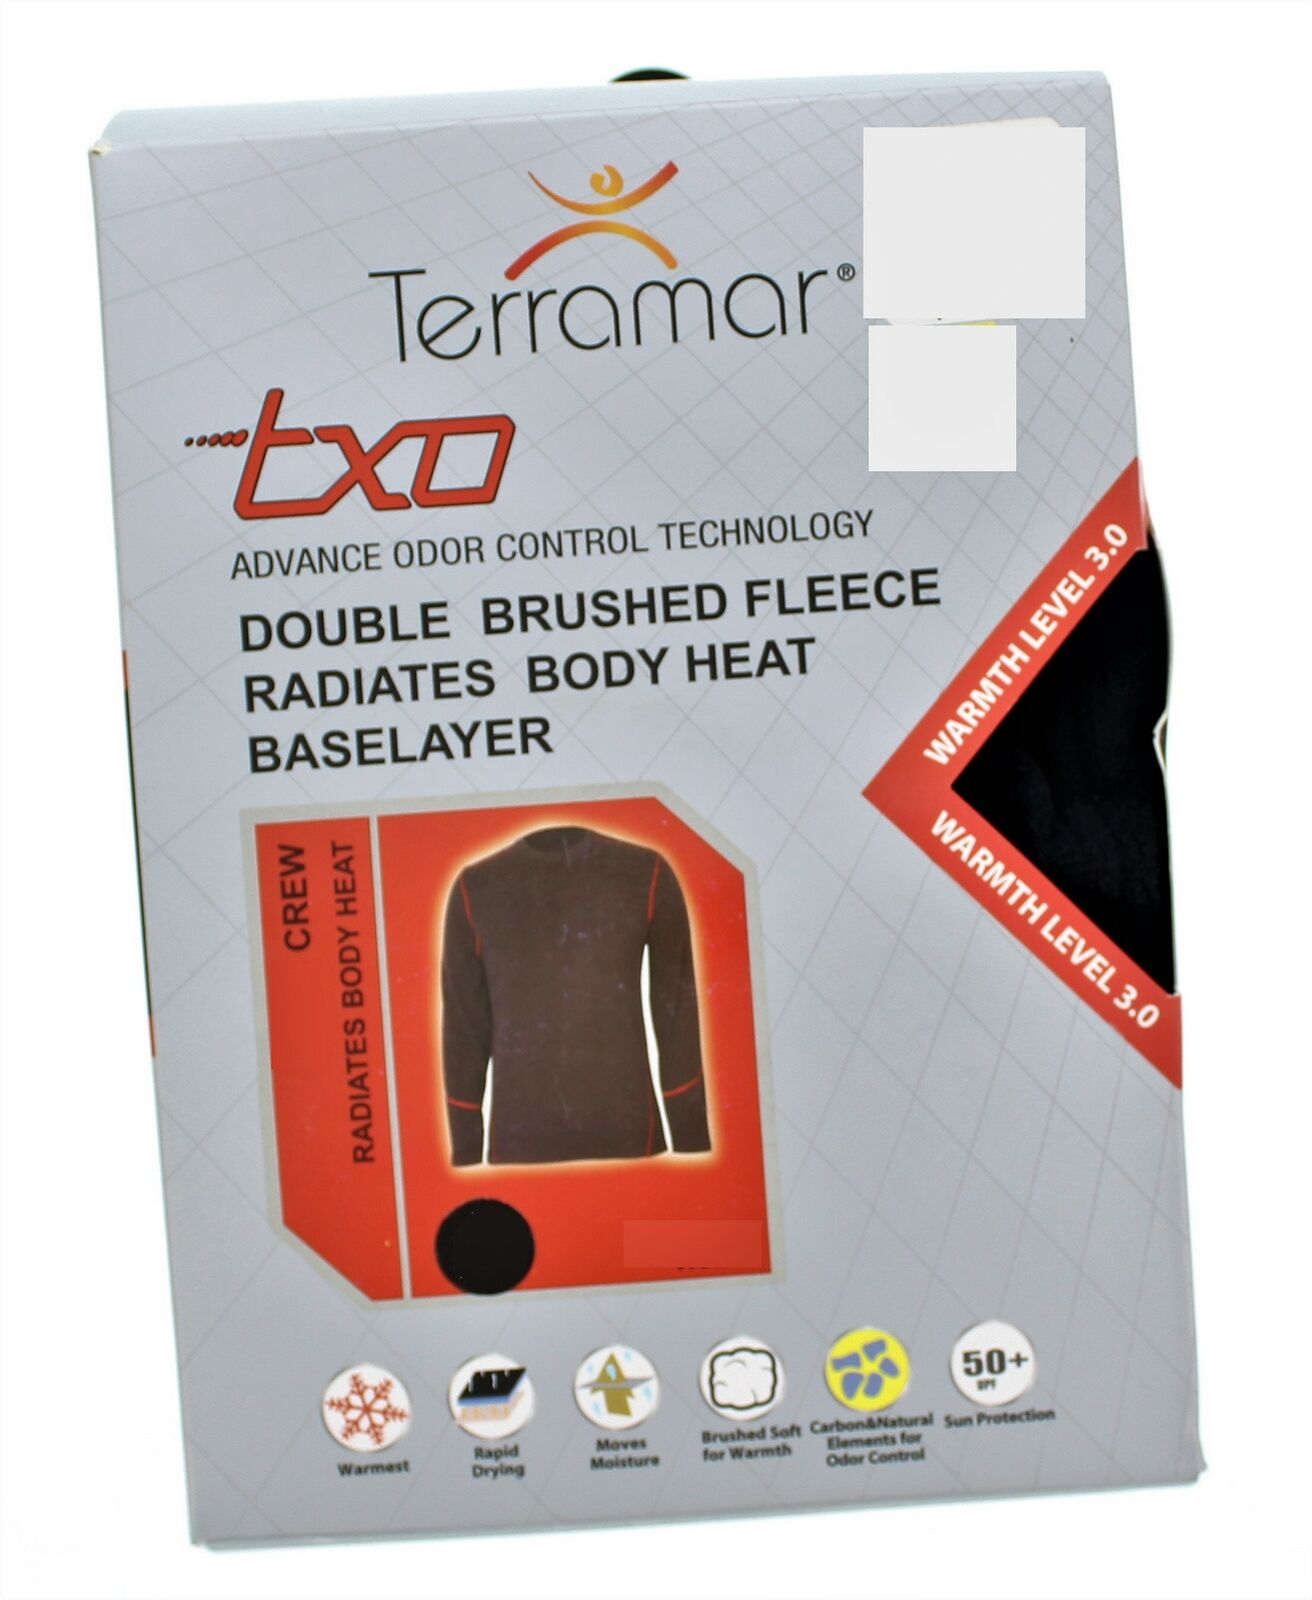 Terramar Mens Double Brushed Fleece Baselayer Crew Shirt Size S 34-36 NWOT